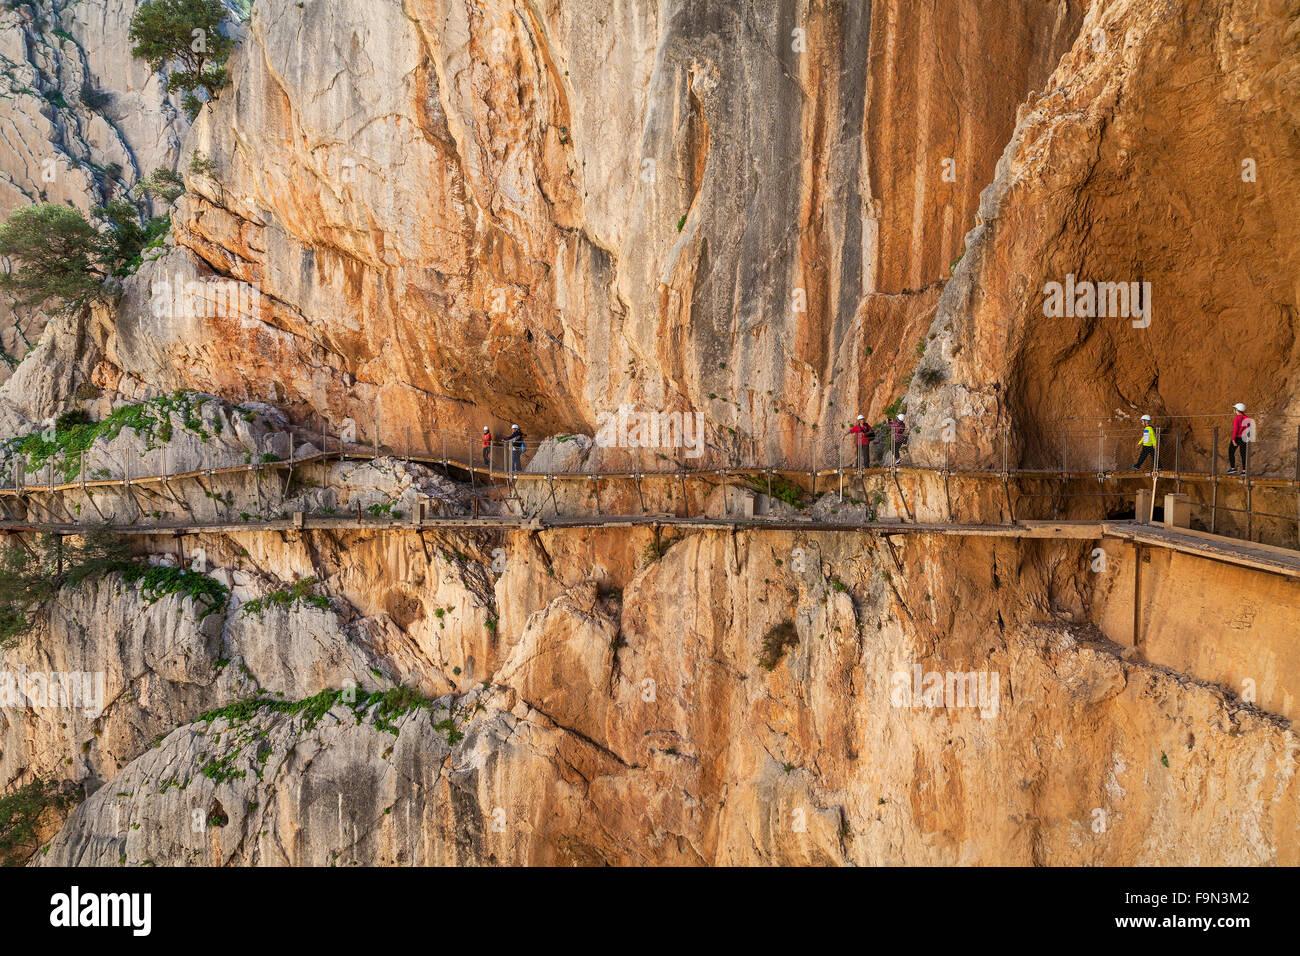 El Caminito del Rey is a walkway, pinned along the steep walls of a narrow gorge in El Chorro, Málaga Province, - Stock Image